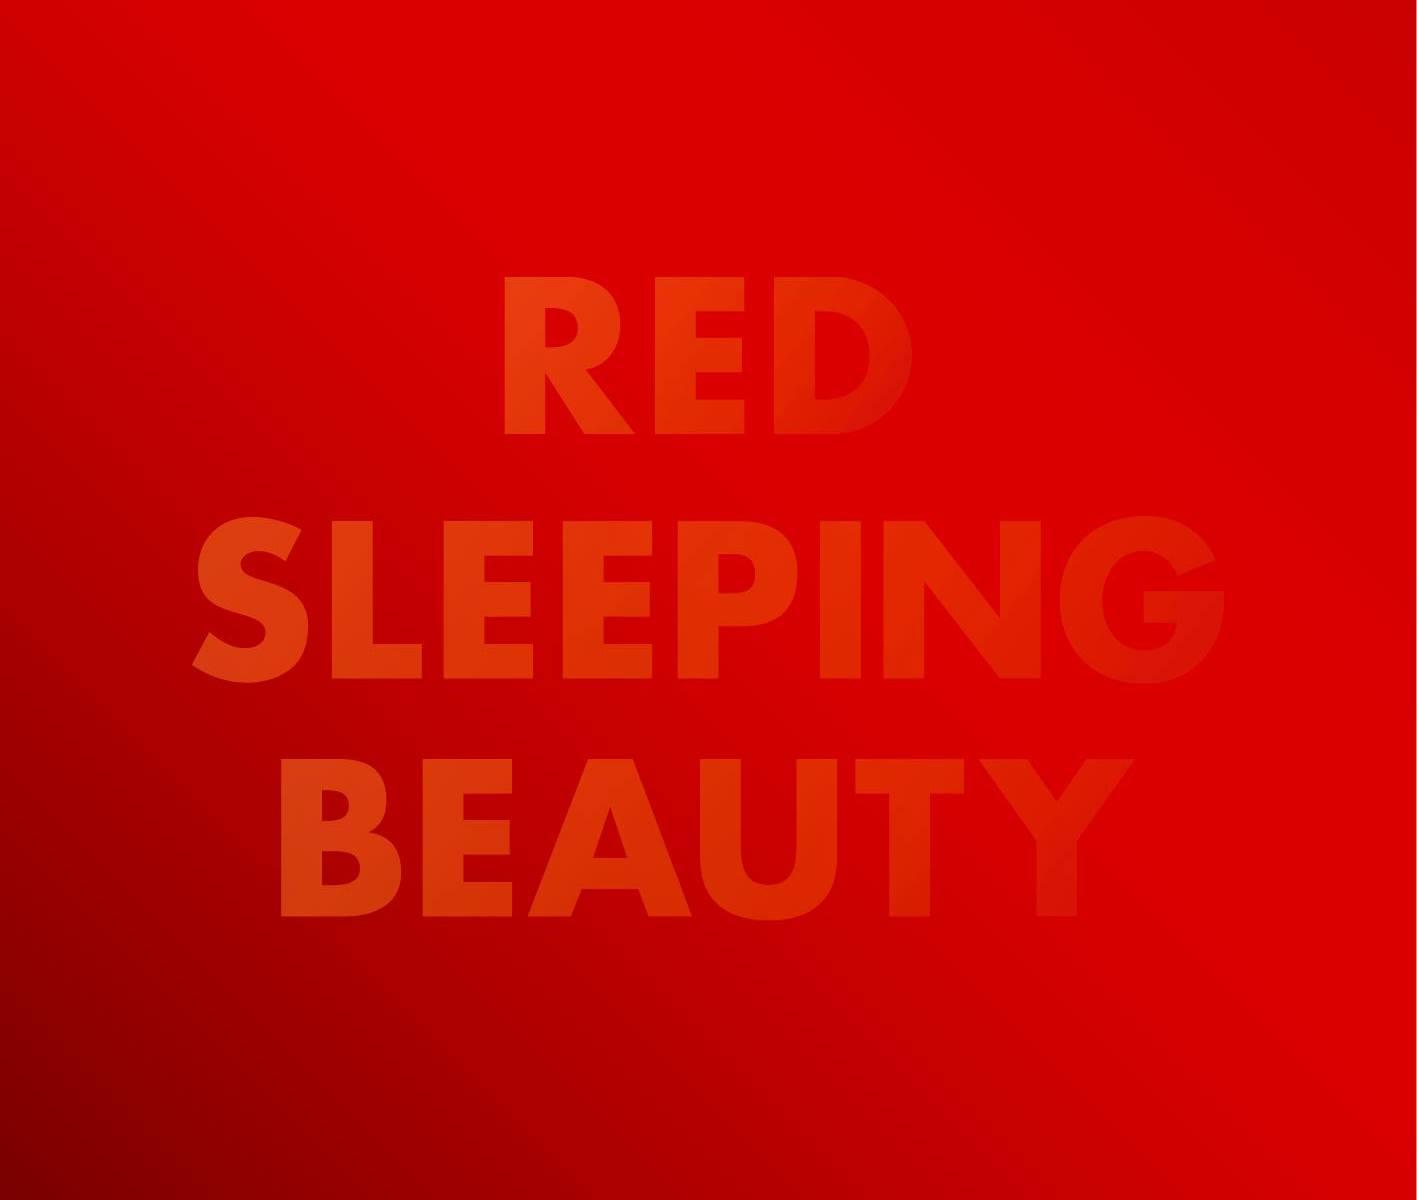 Red Sleeping Beauty